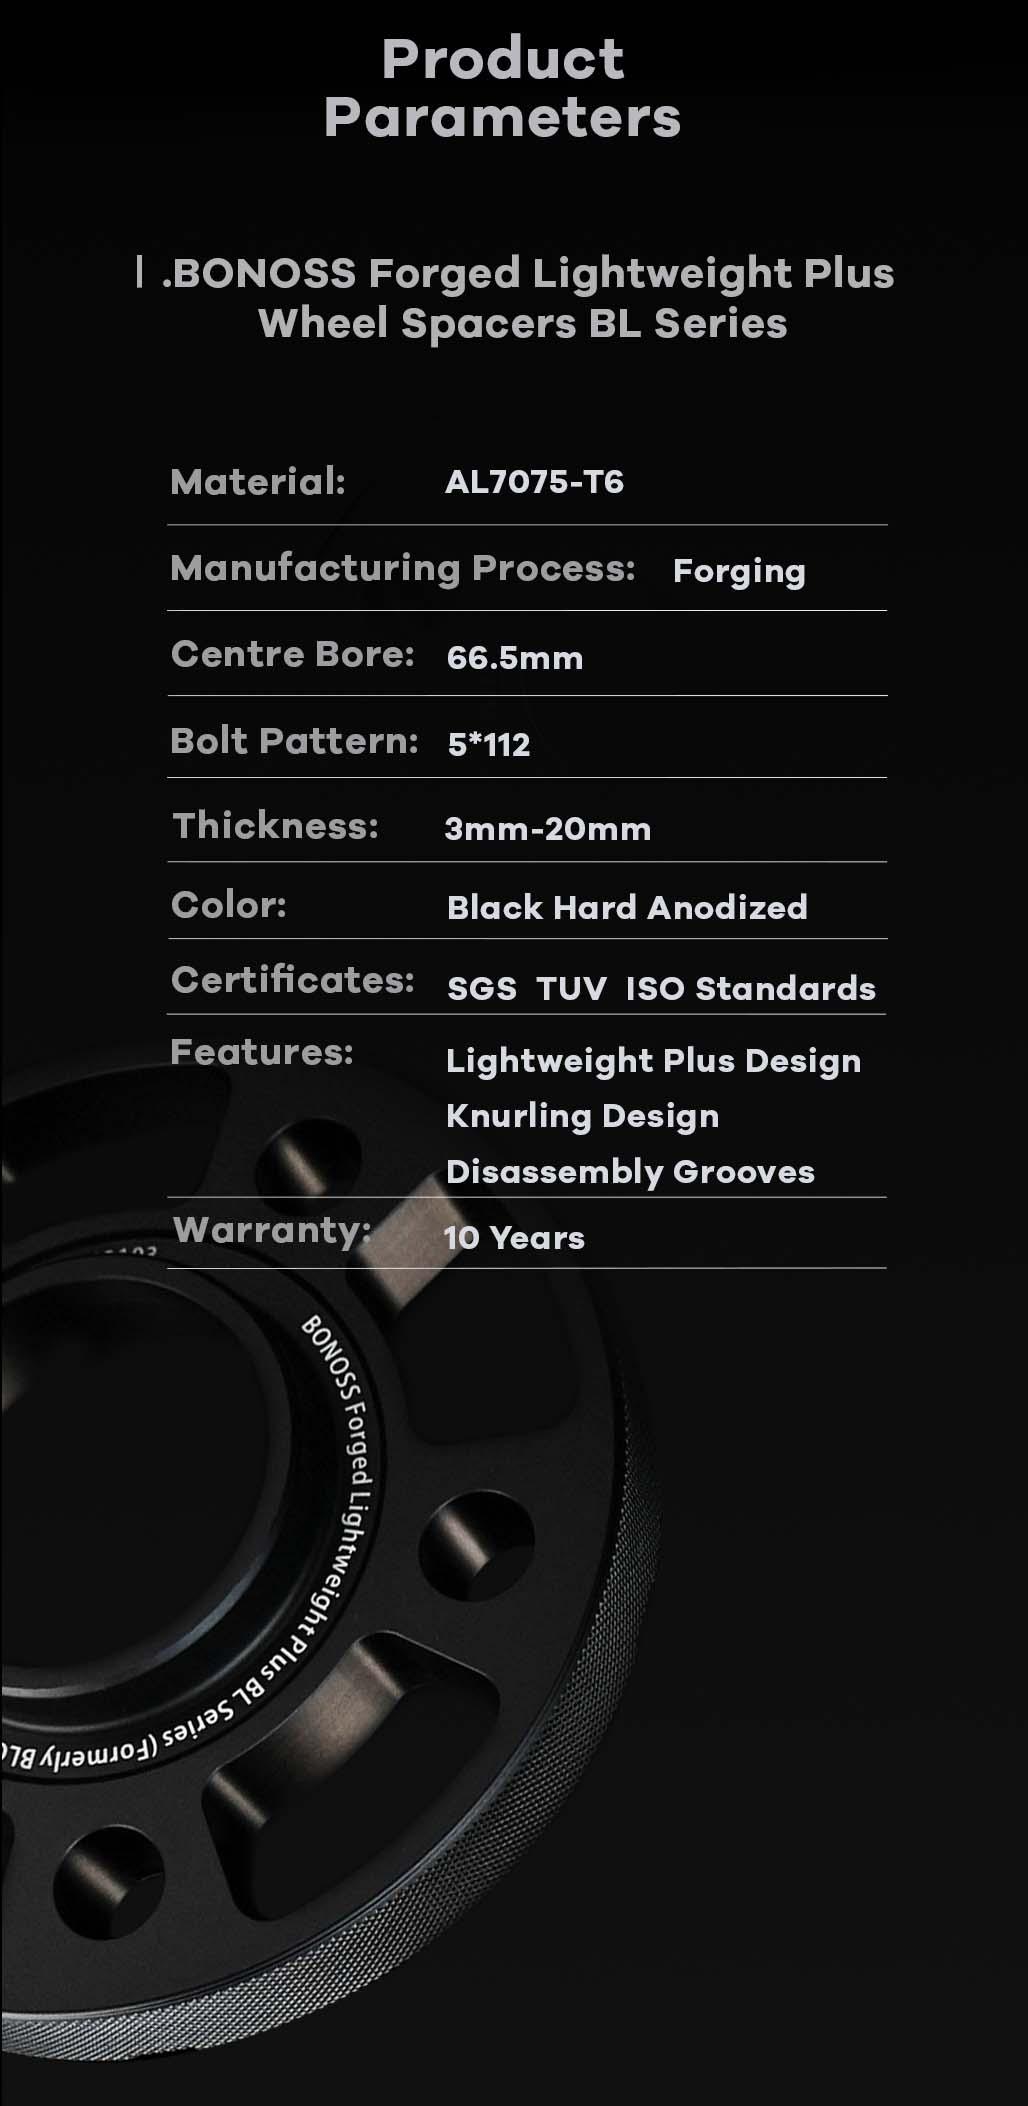 AL7075-T6 BONOSS forged lightweight plus wheel spacers 5x112 66.5 14x1.25 cone seat-by lulu-9